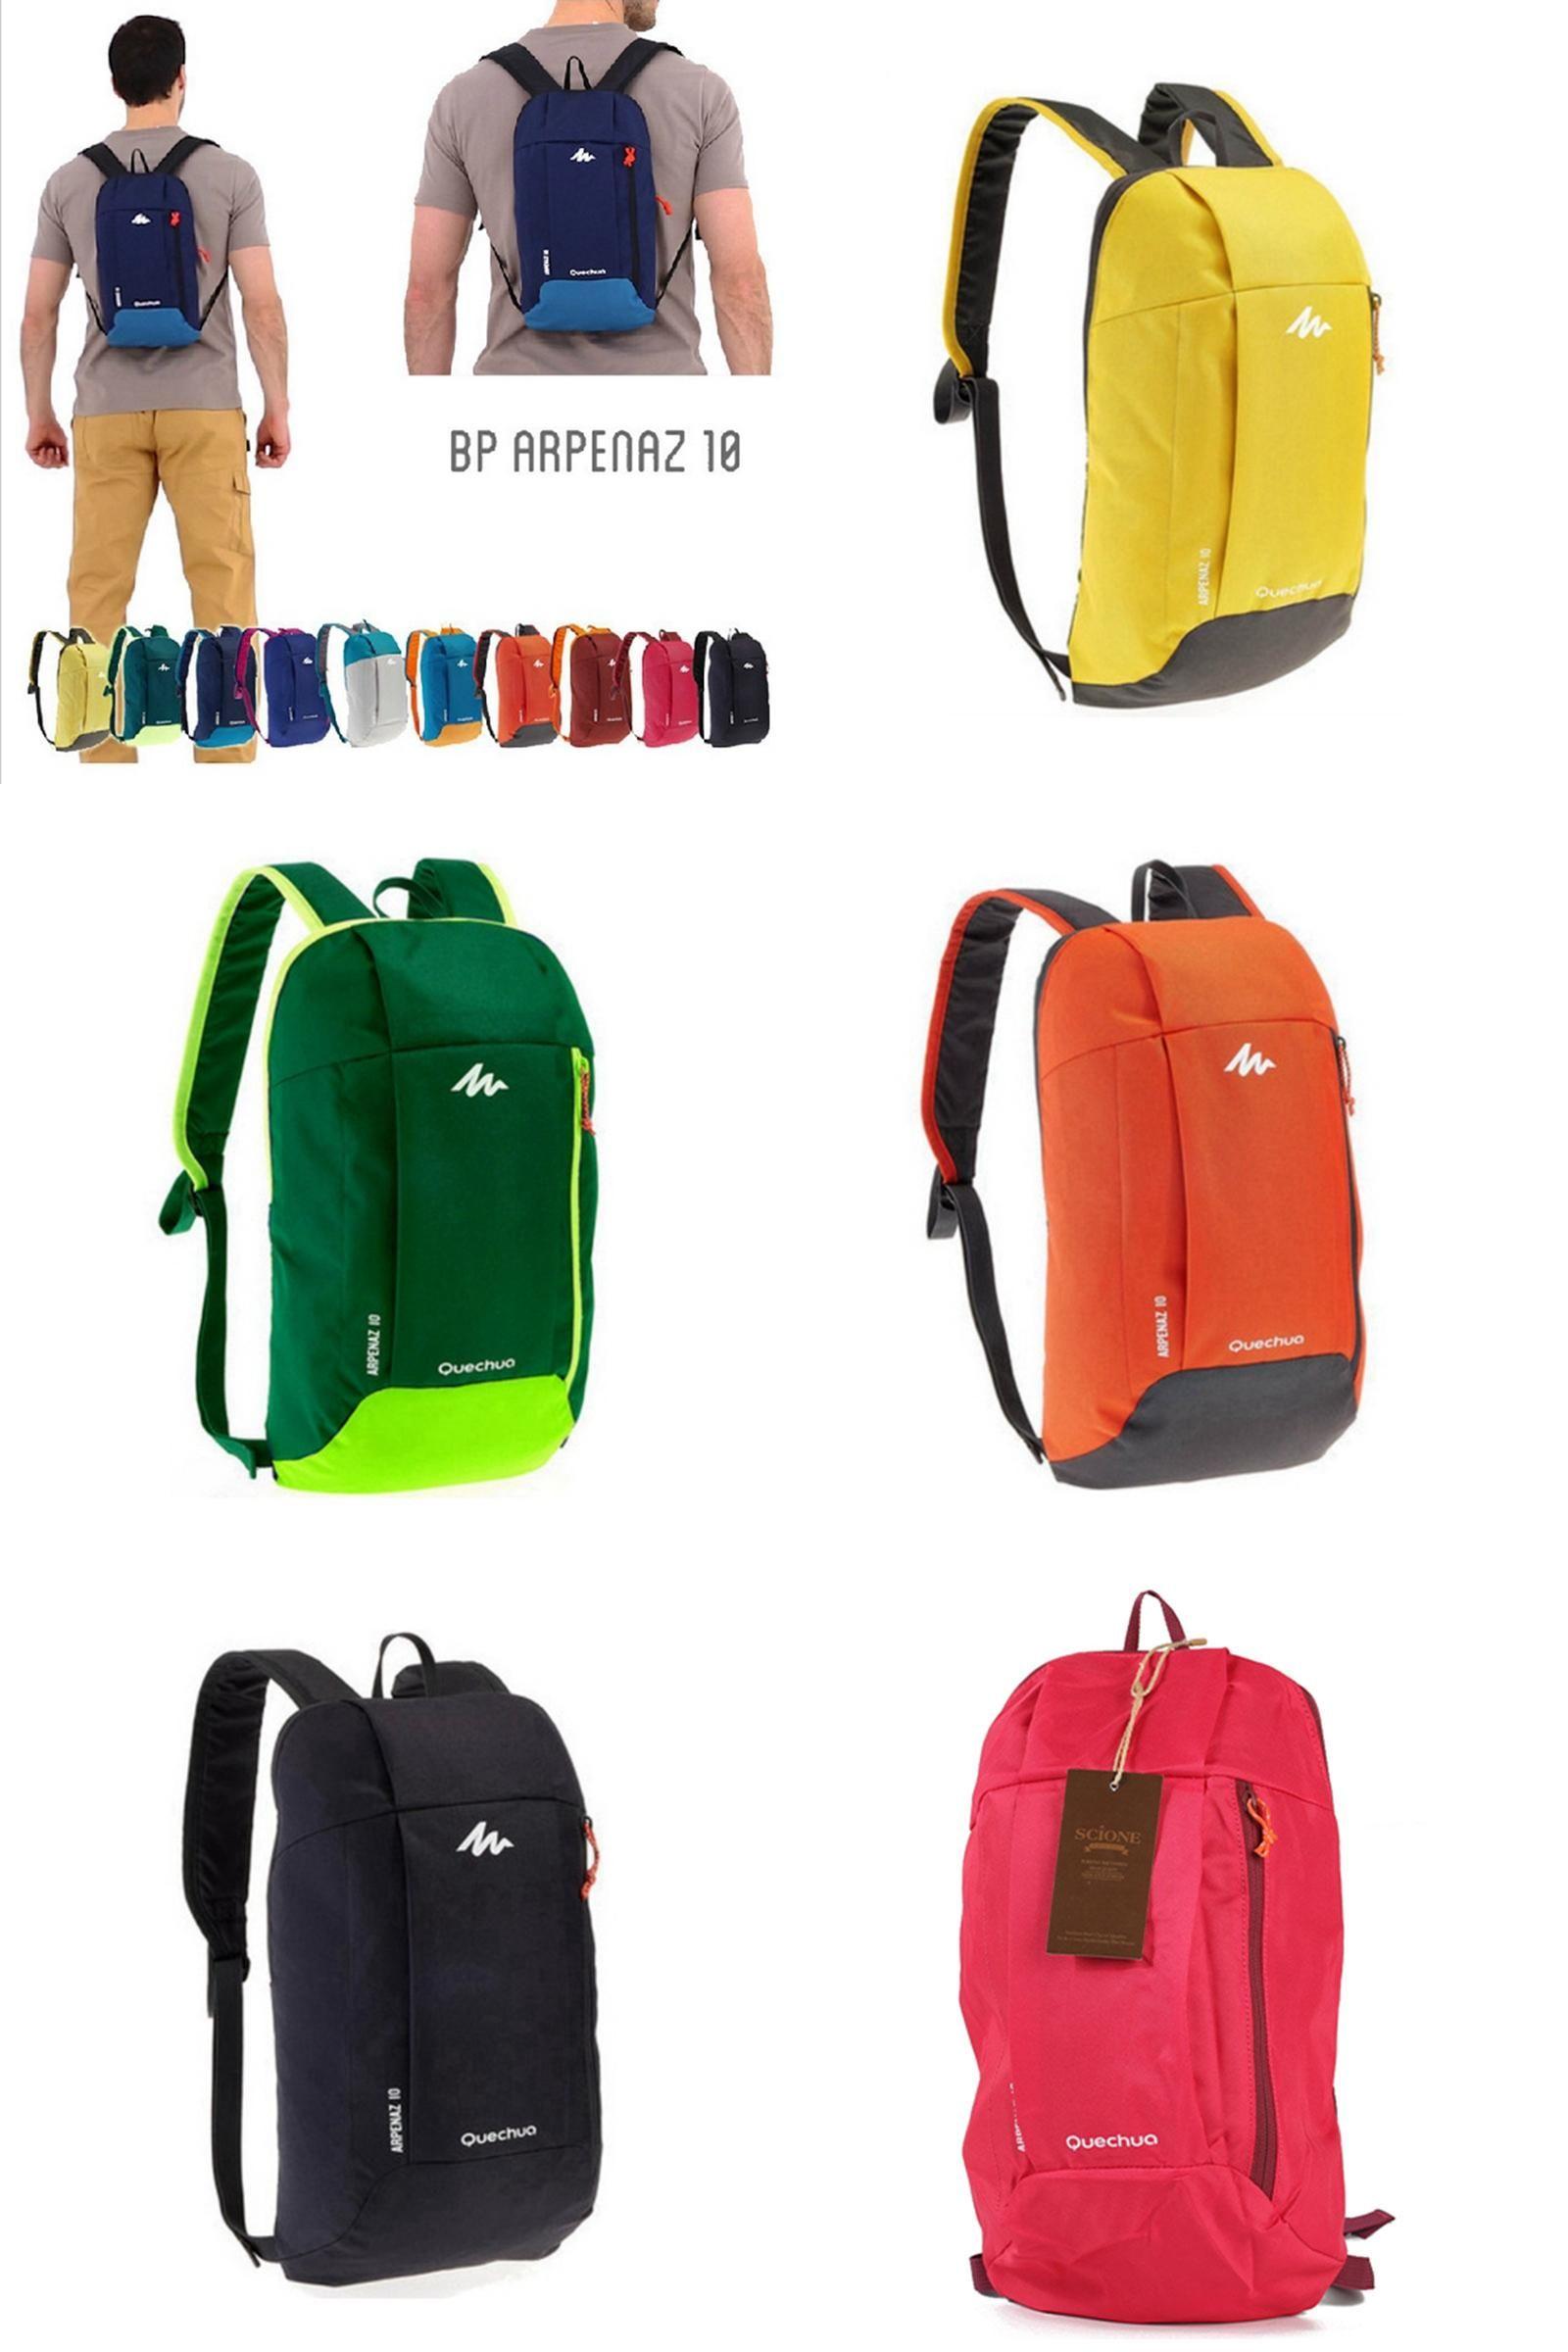 Ceiling Lights & Fans Customized Backpack Men Basket-ball Printing School Schoolbag For Teenagers Man Students Bookbag Boys Satchel Shoulder Bag High Quality First